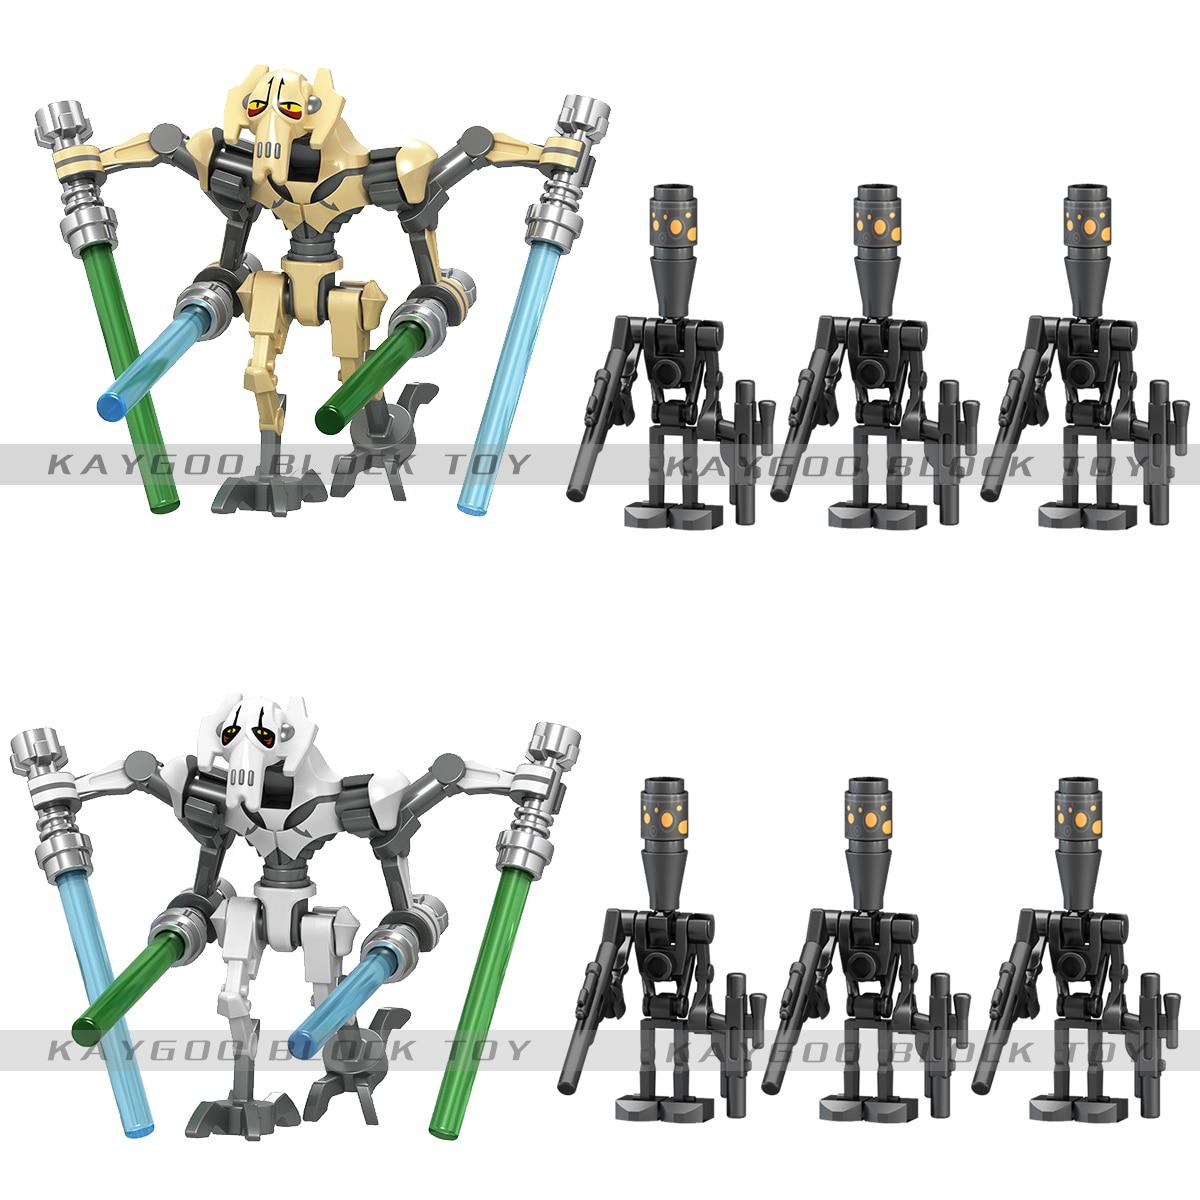 Single Sale Star Space Wars Figures Models Building Blocks Brick Model Set Toys For Children Chrismas Gift(China)